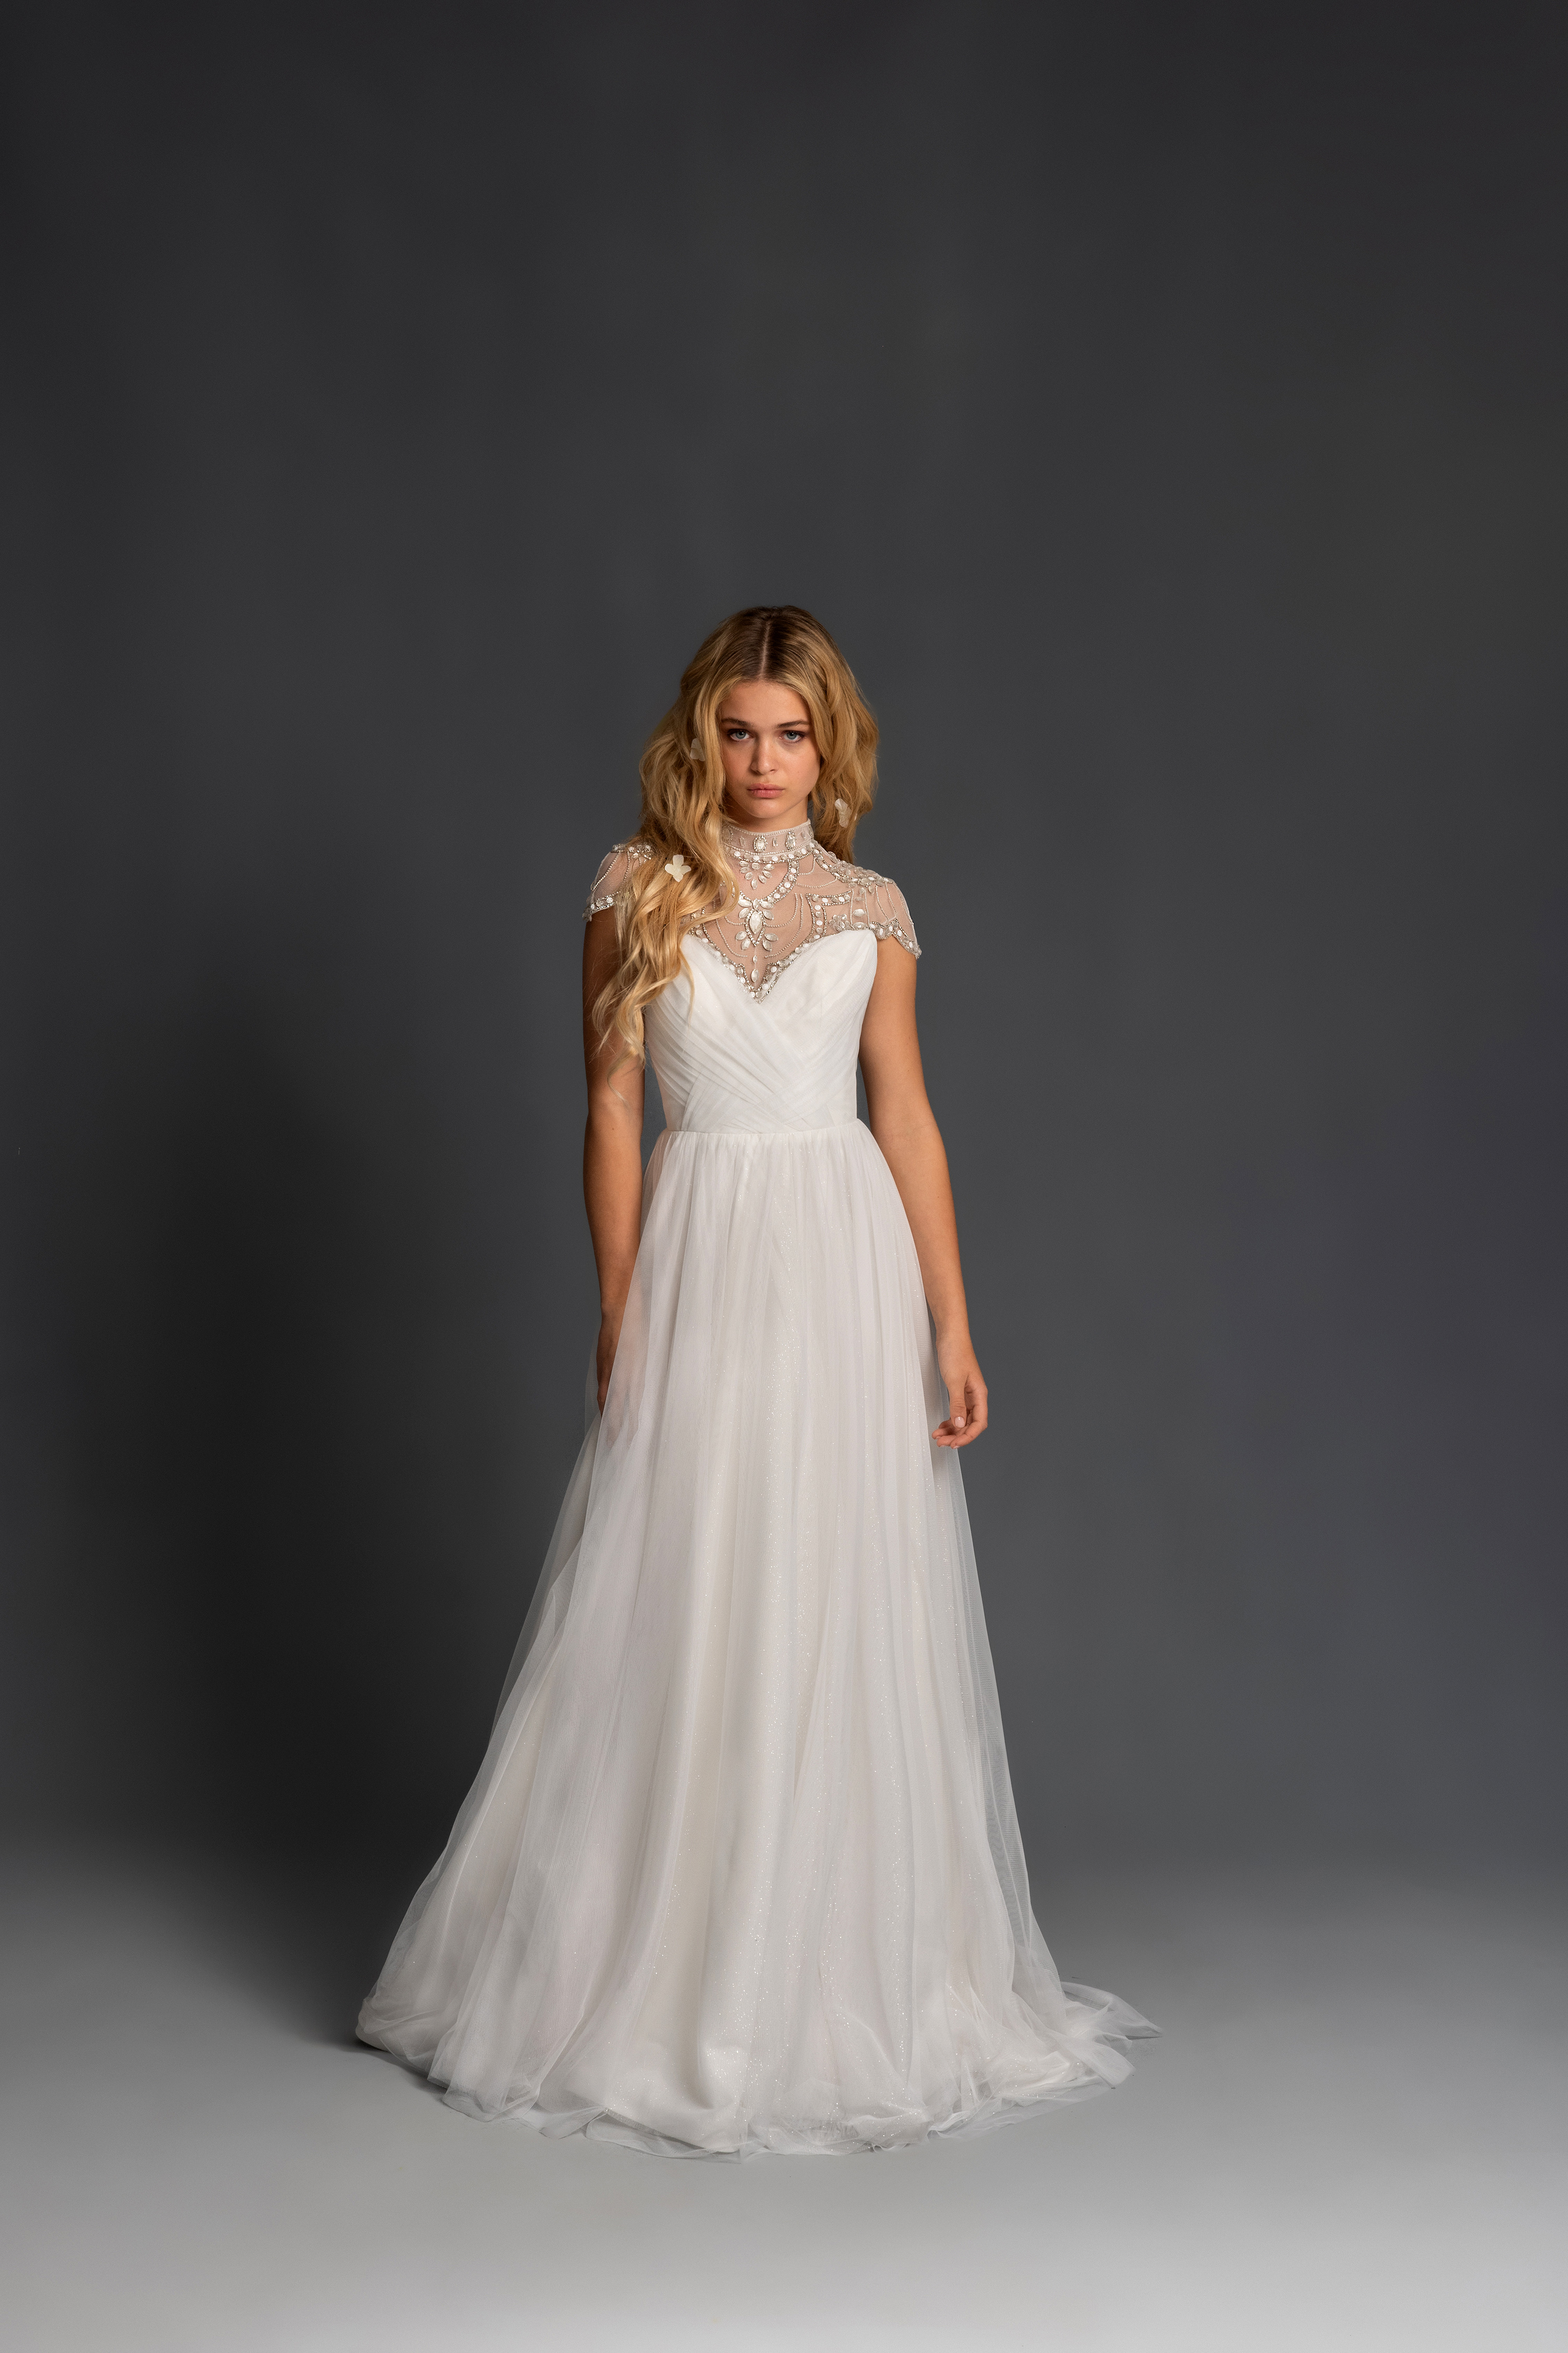 blush hayley paige cap sleeves high neck illusion a line wedding dress spring 2020